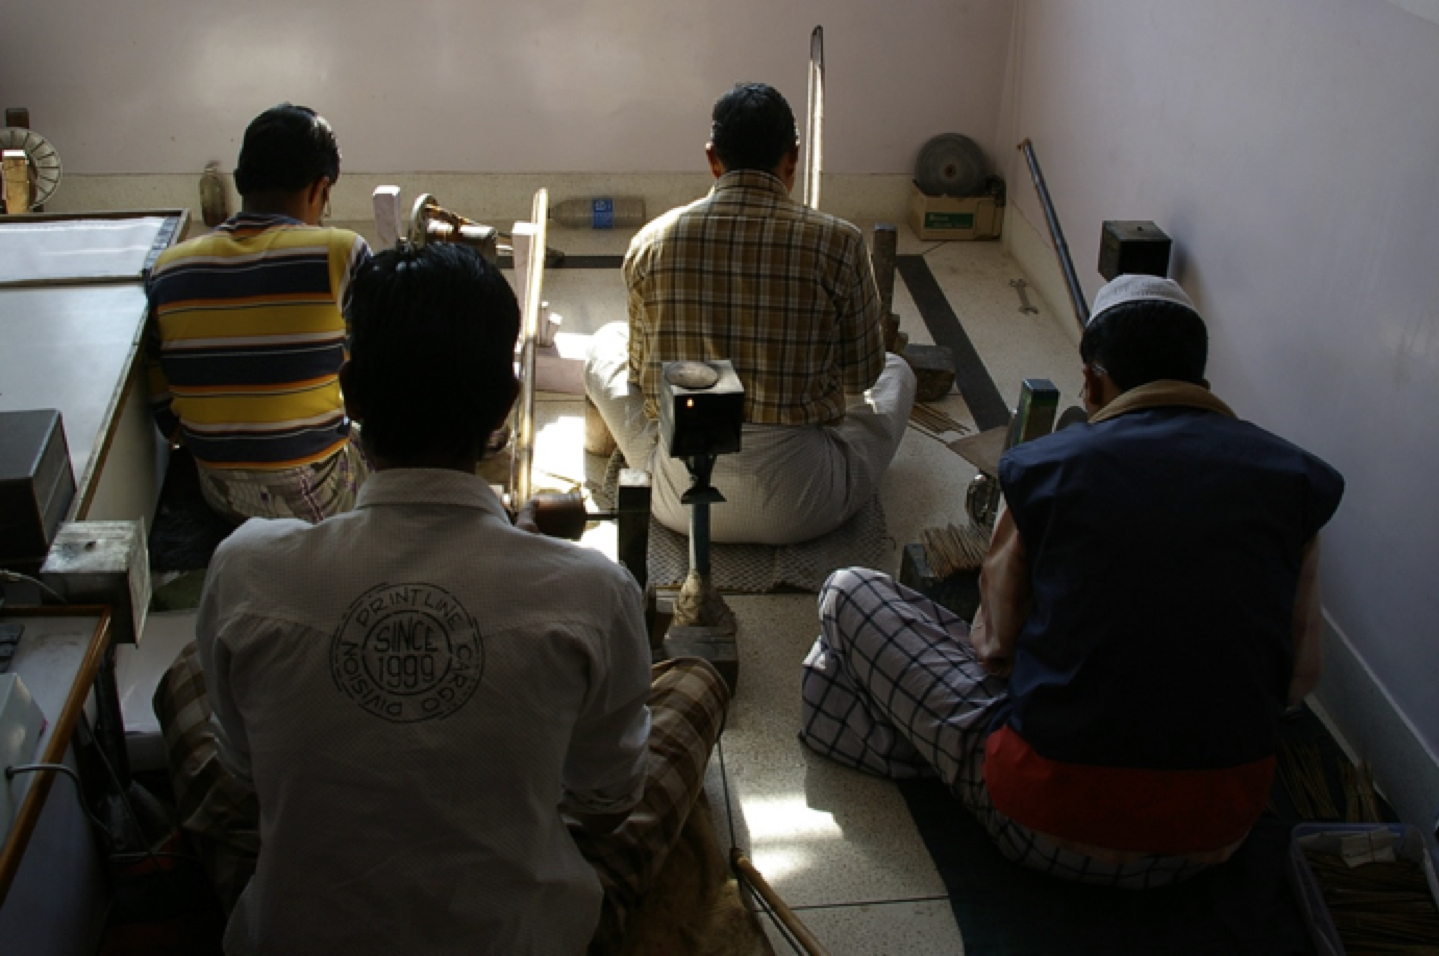 tanzanite cutting workshop in Jaipur India.jpg